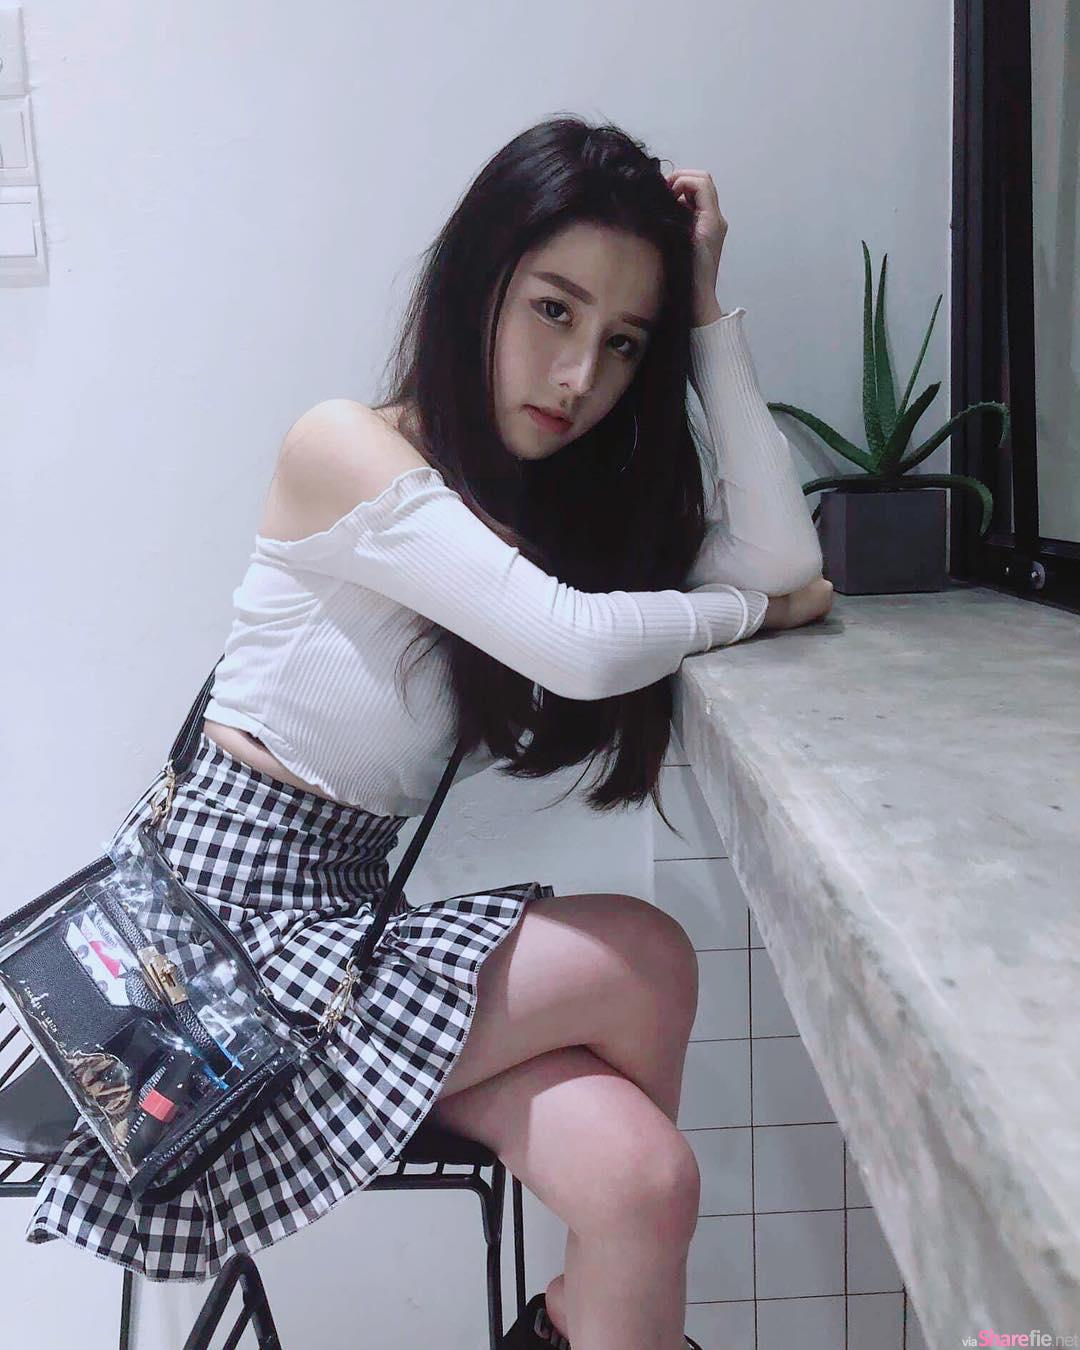 槟城正妹Jenny Lai 矜霓,清新甜美系